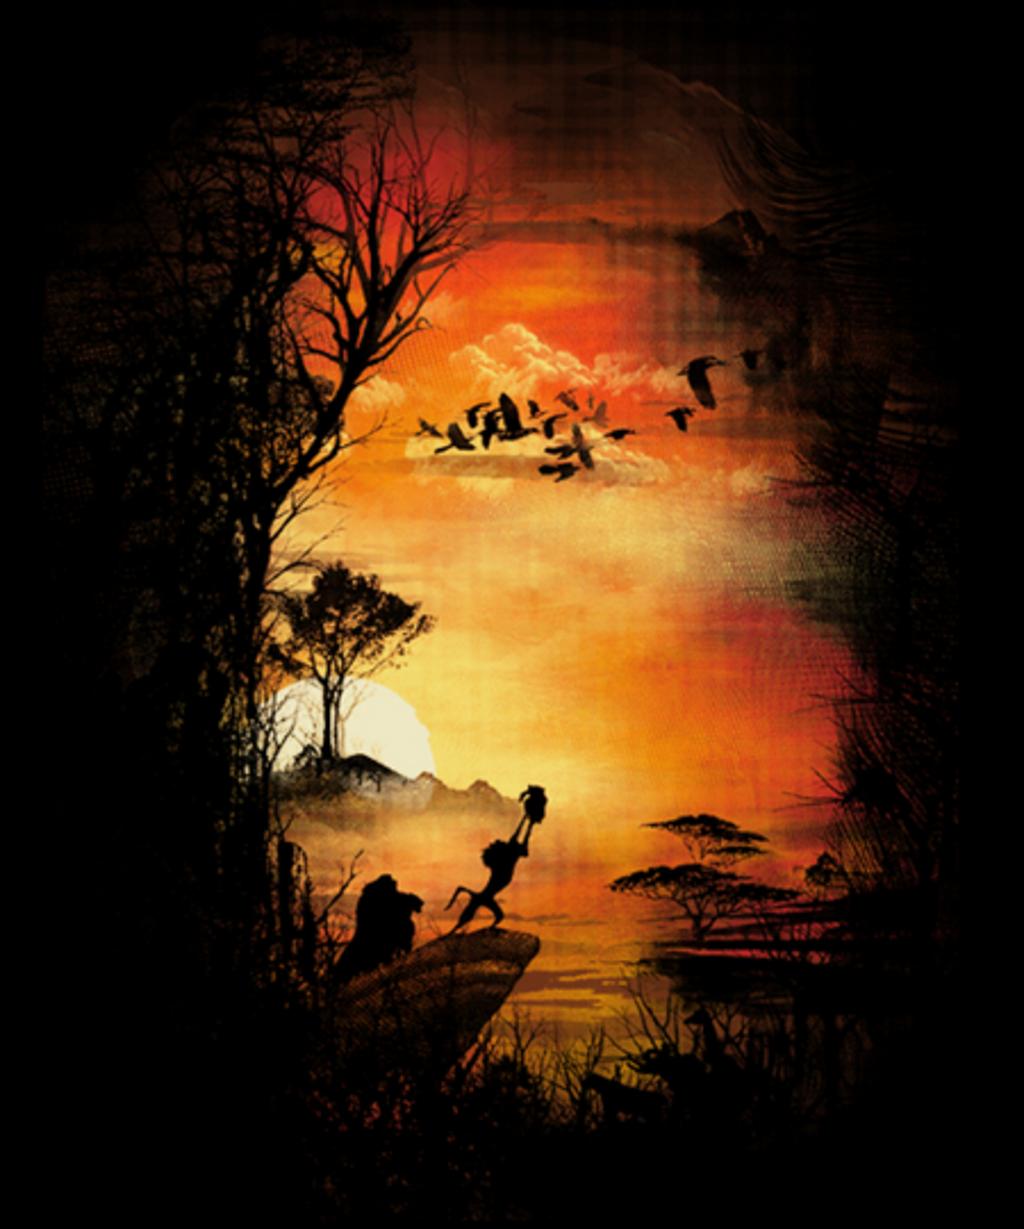 Qwertee: The King Sunrise